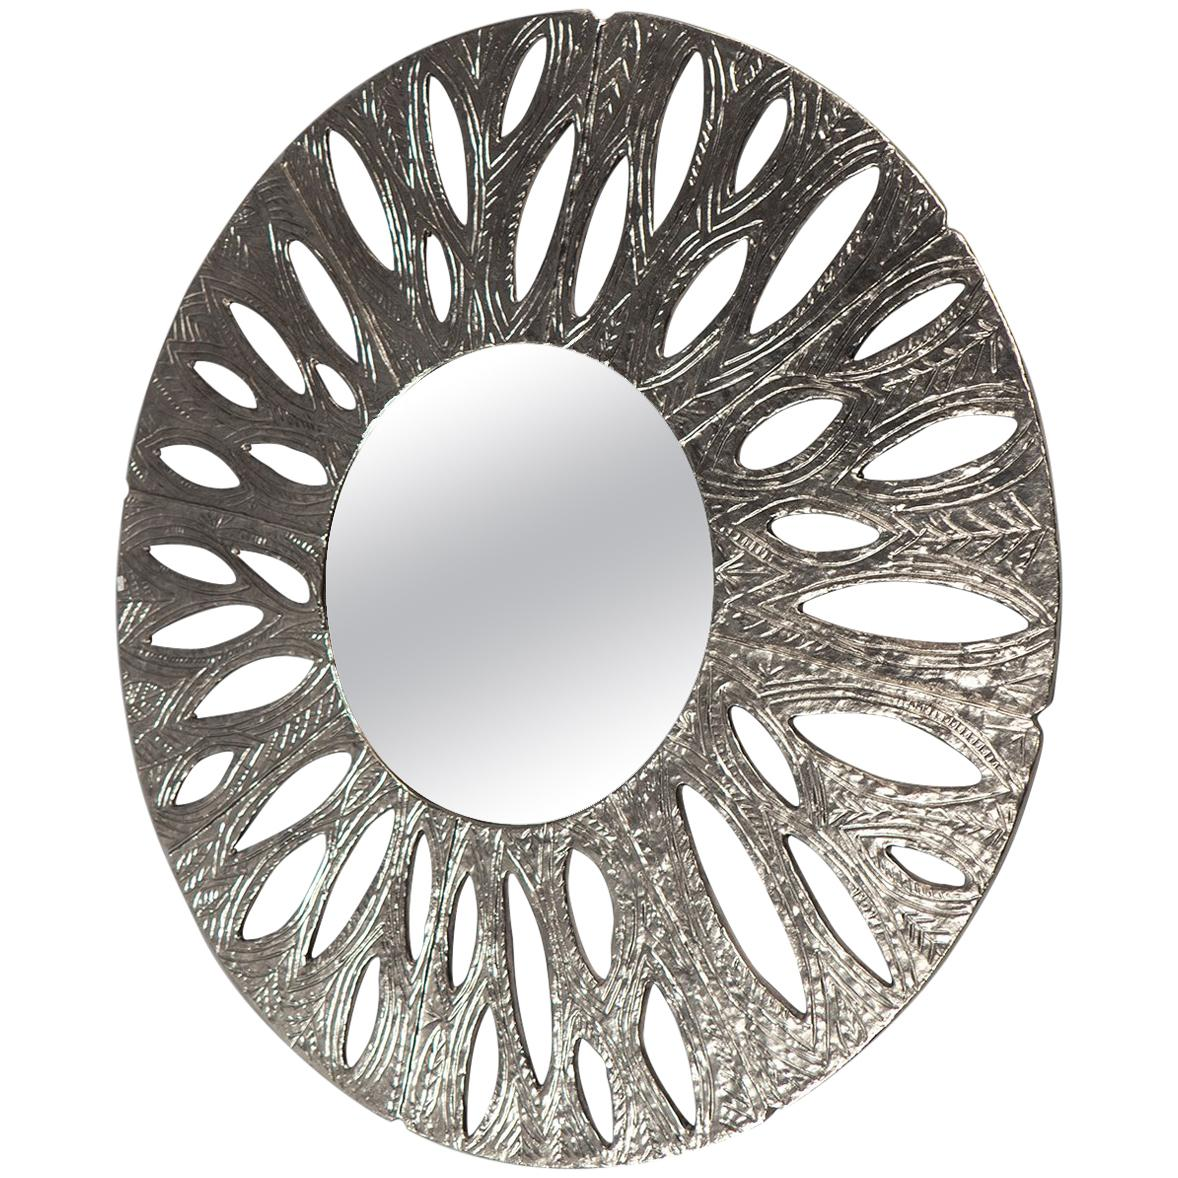 Mirror by Franck Evennou, France, 2019